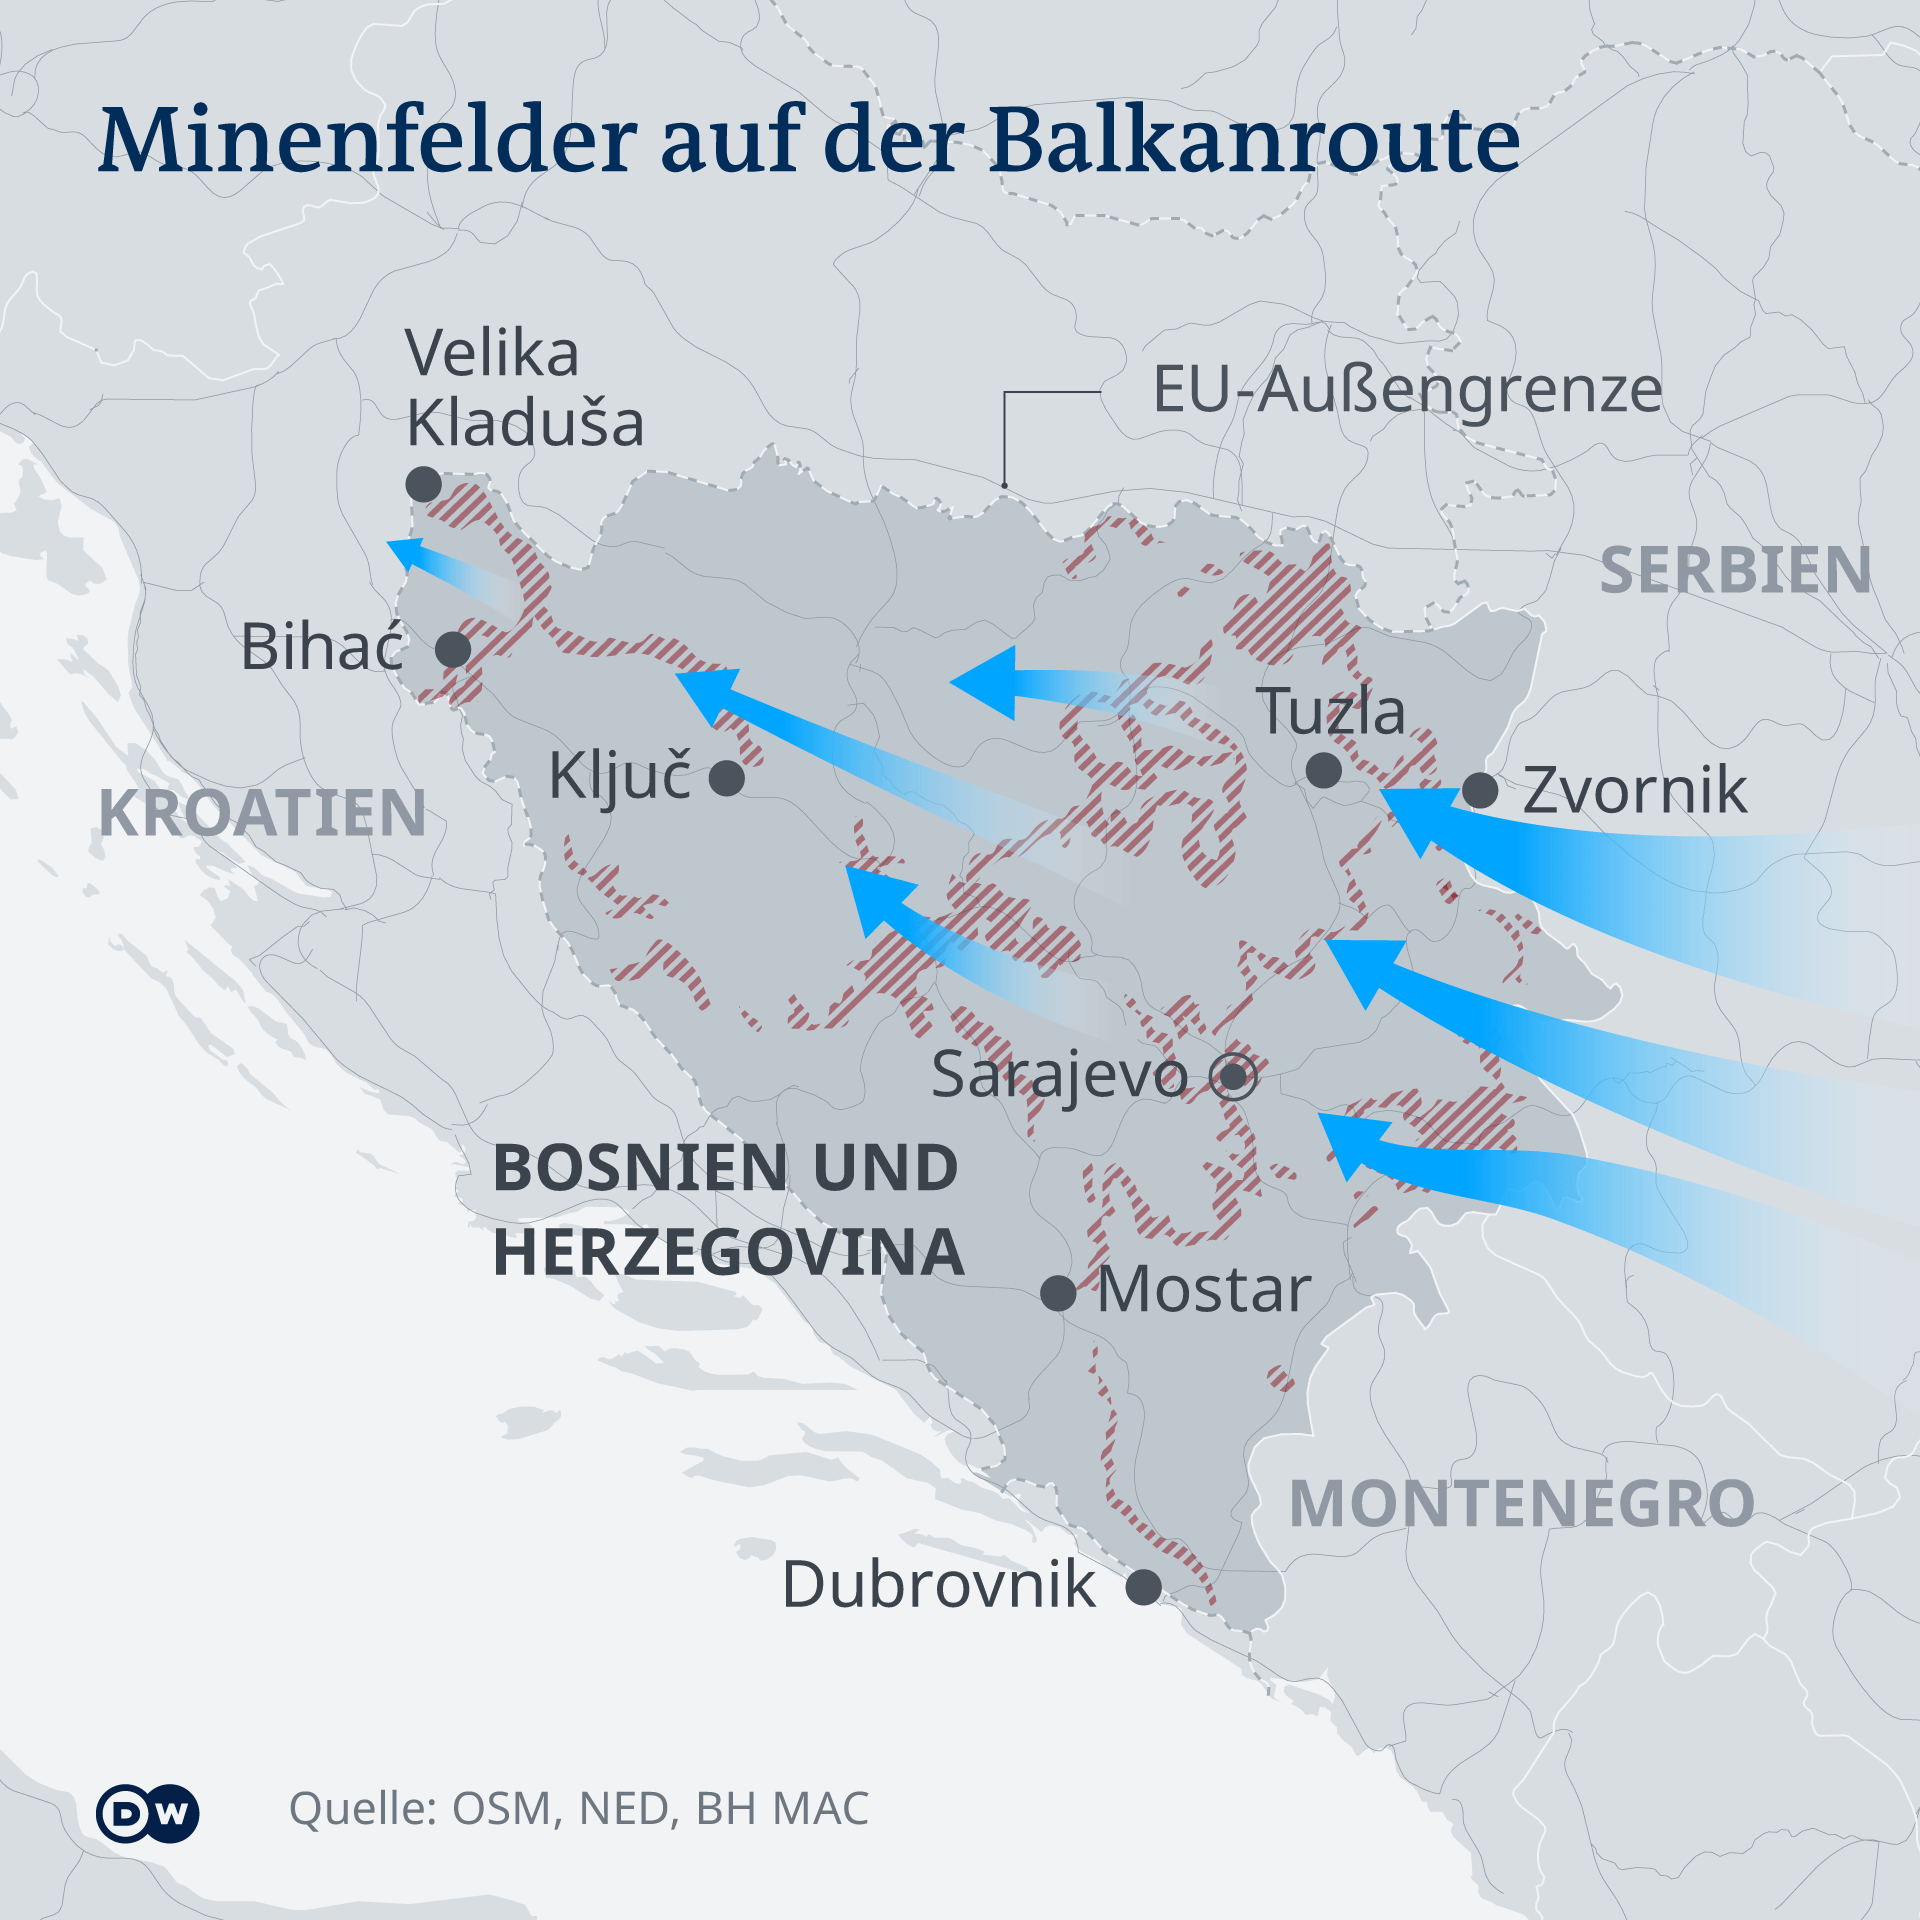 Grafik - Minenfelder auf der Balkanroute - DE